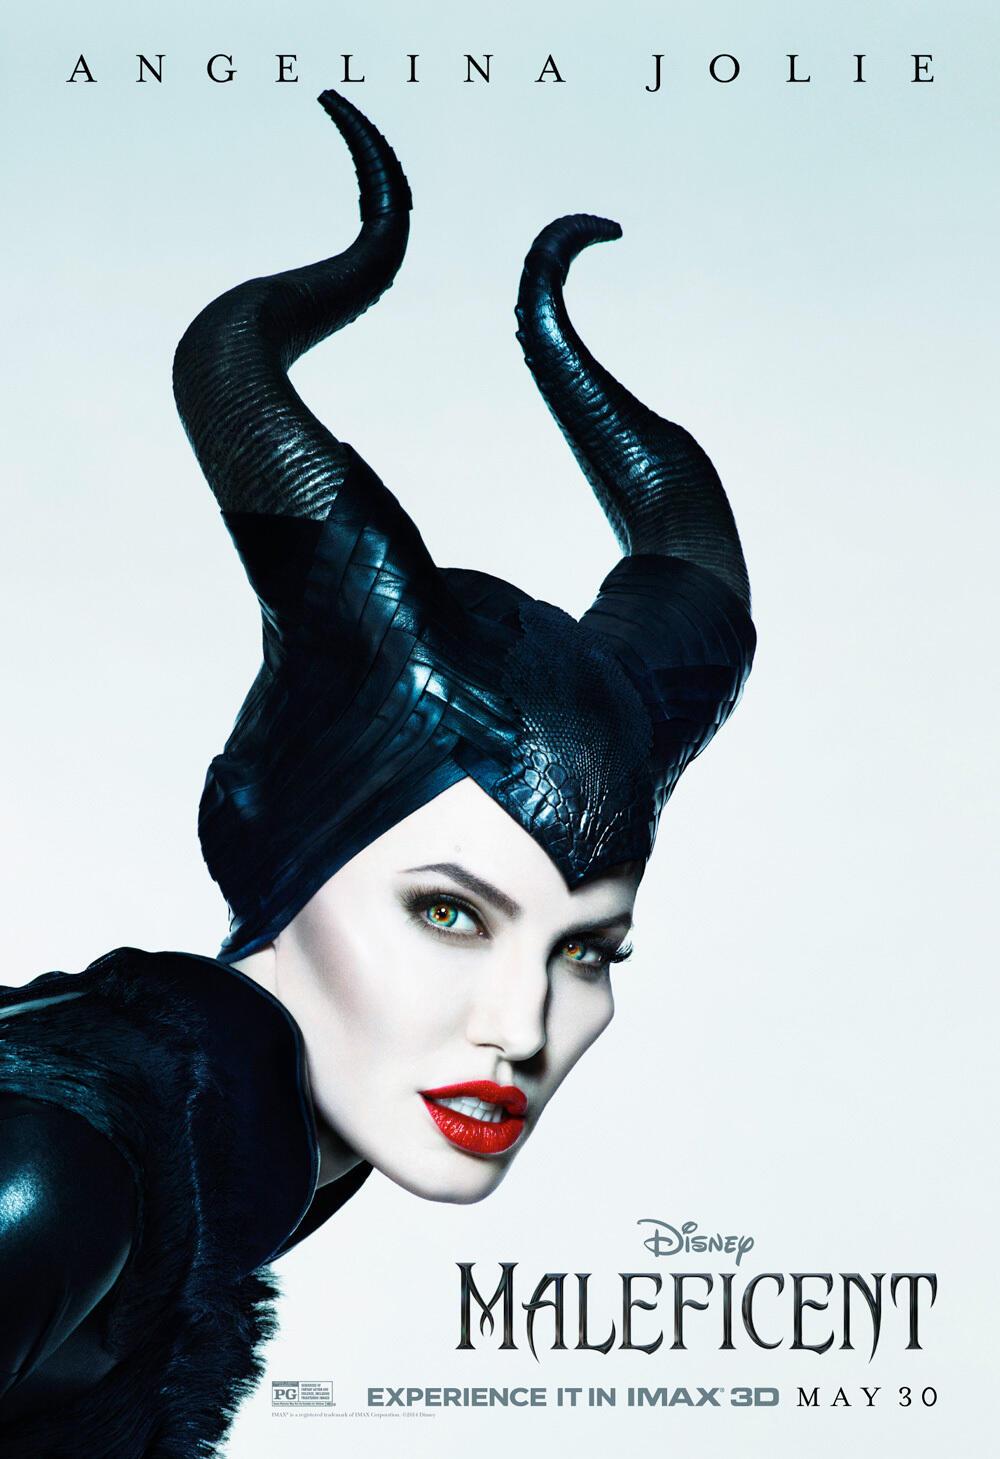 Maleficent Feen